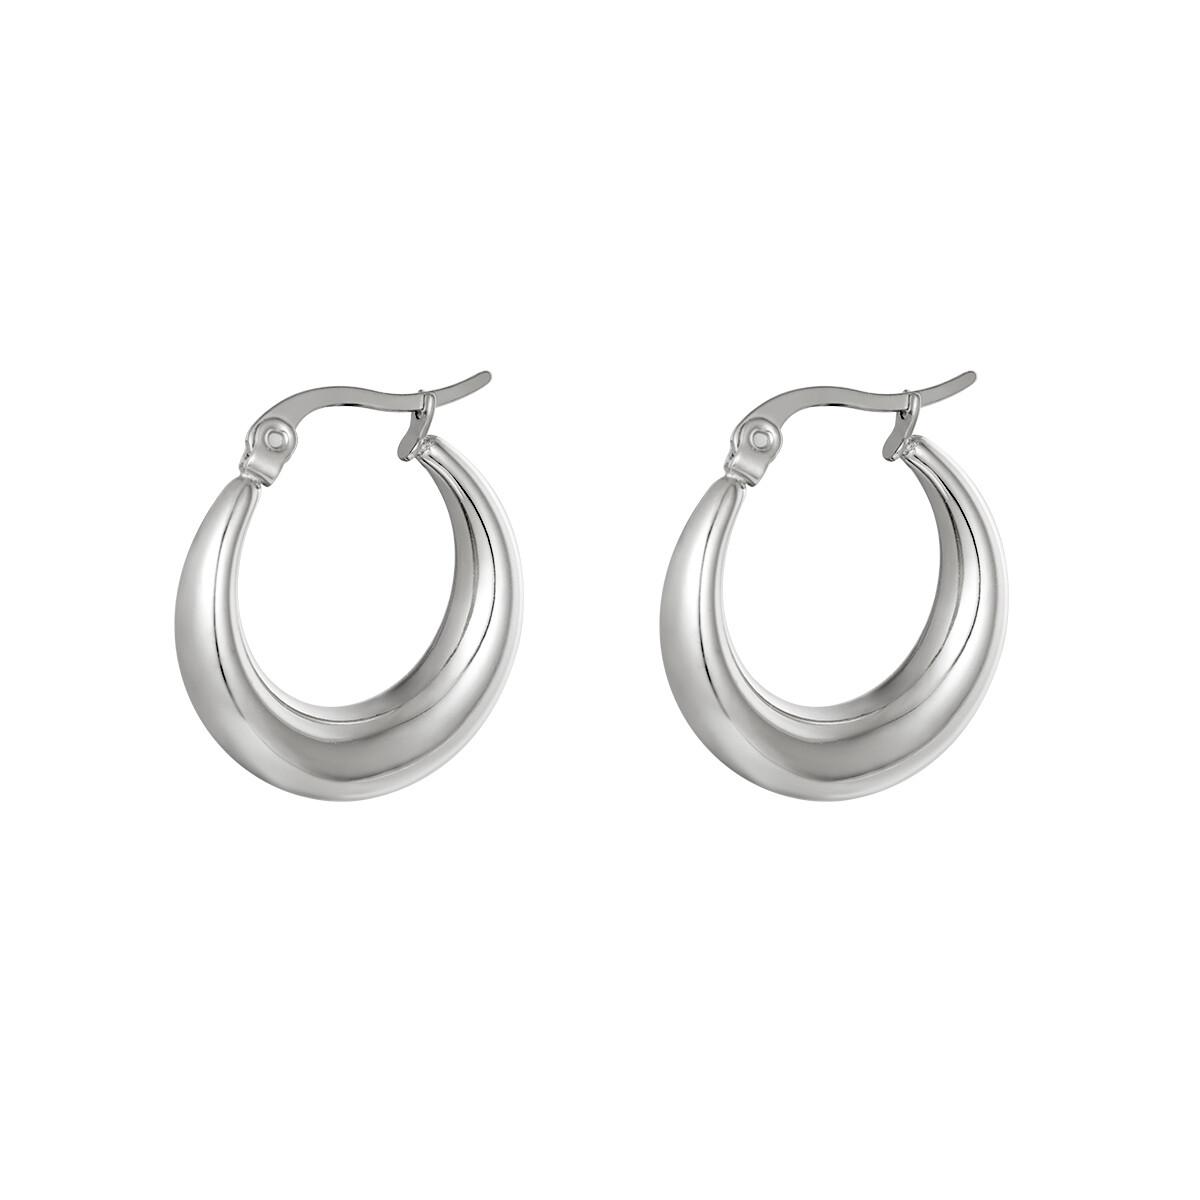 Gewelfde oorringetjes zilver 23 mm stainless steel